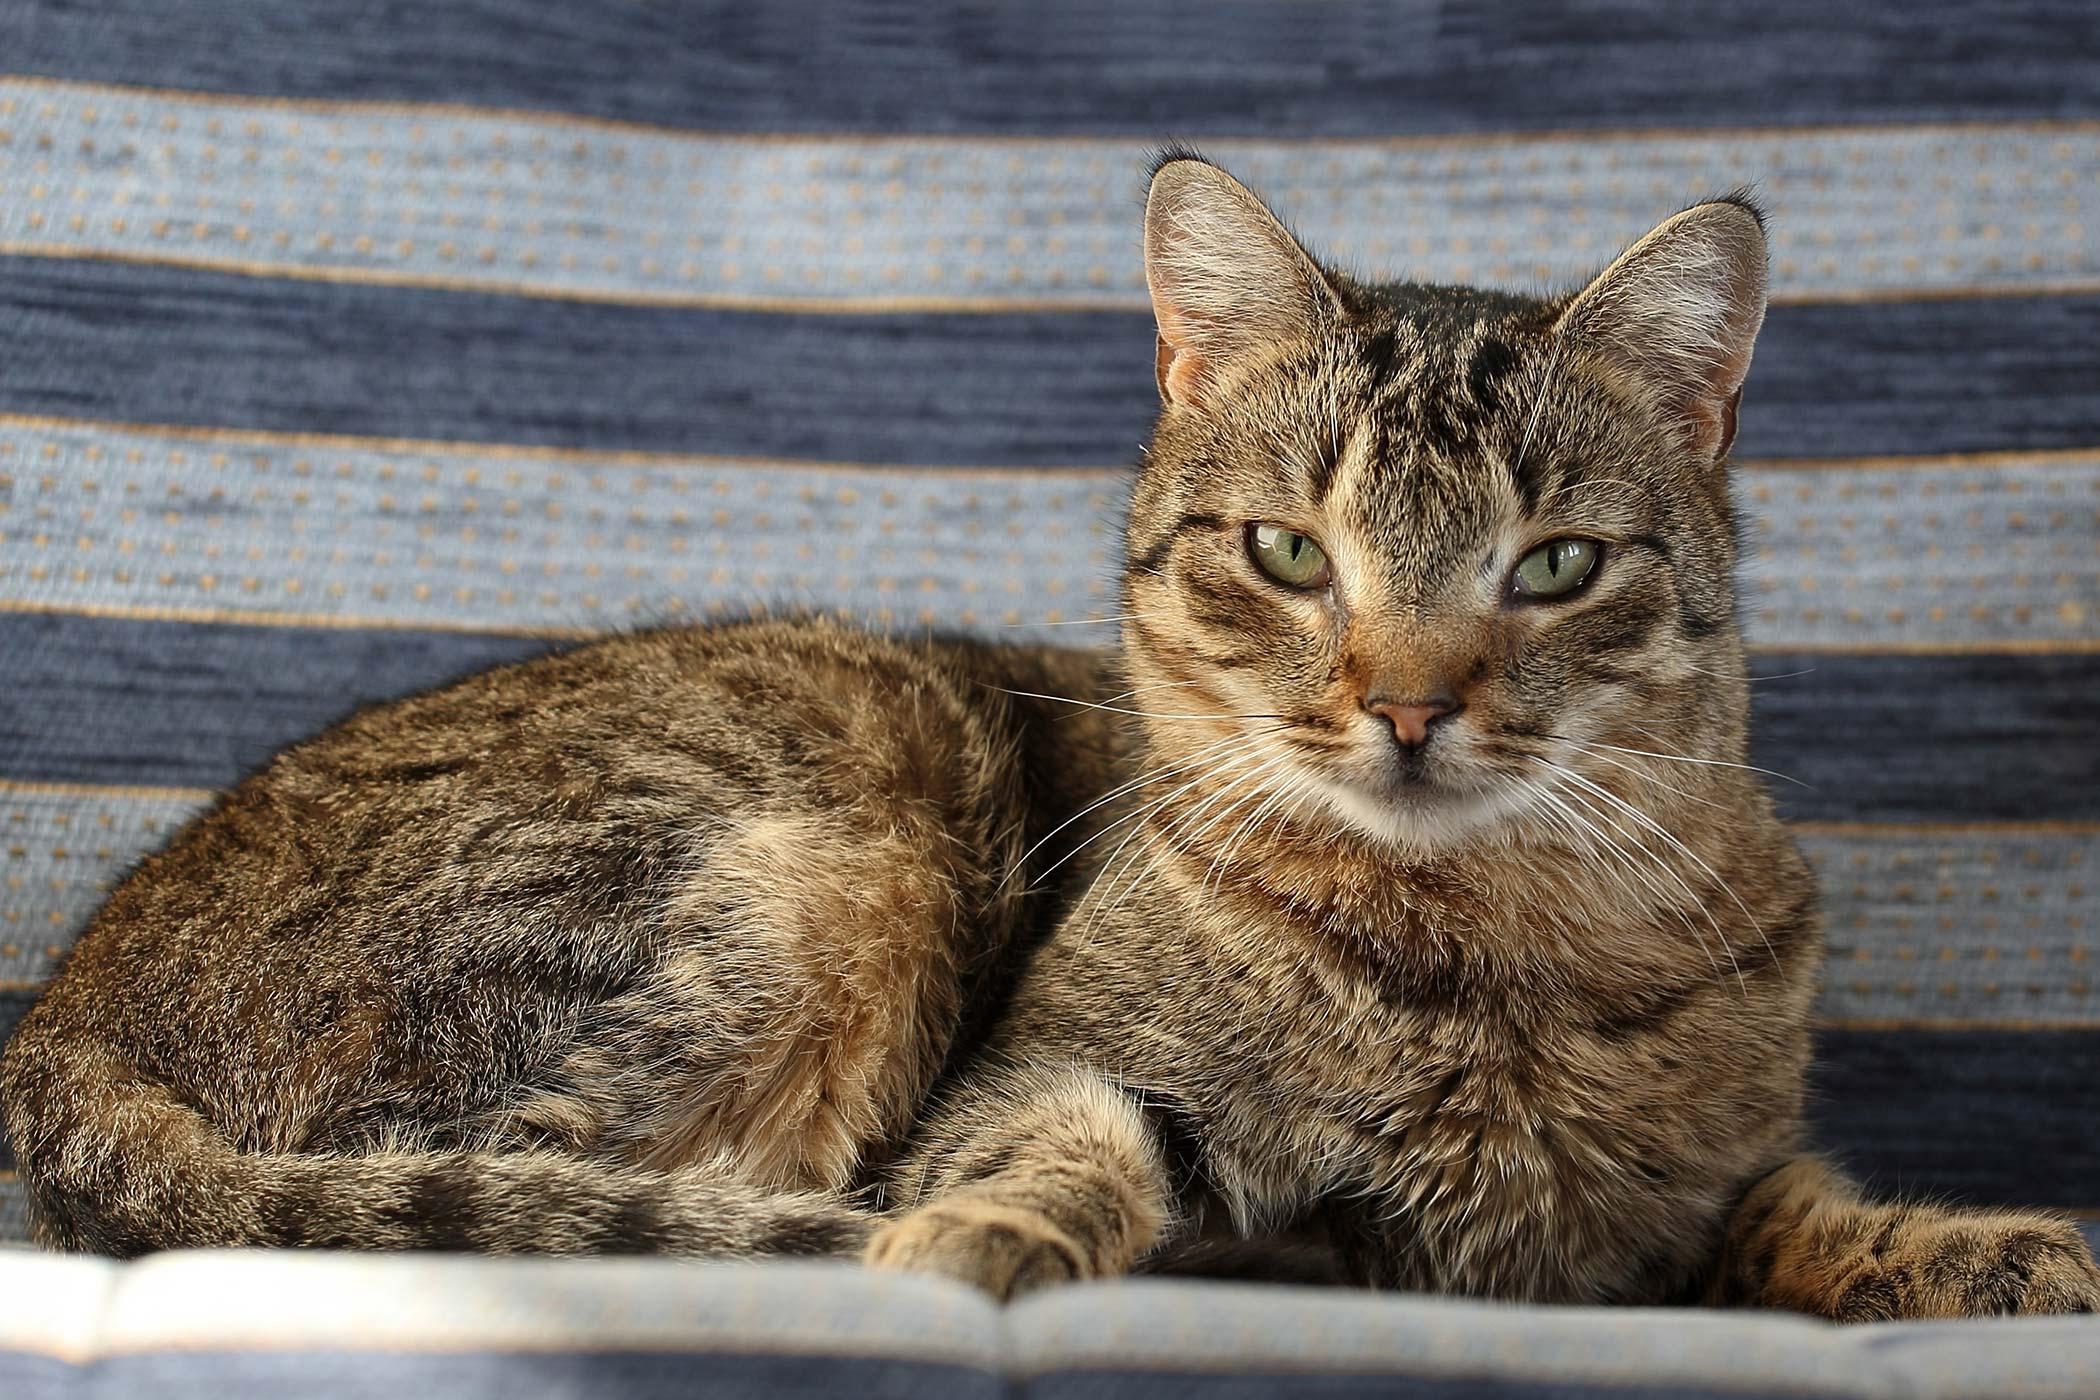 Degeneration of the Cerebellum in Cats